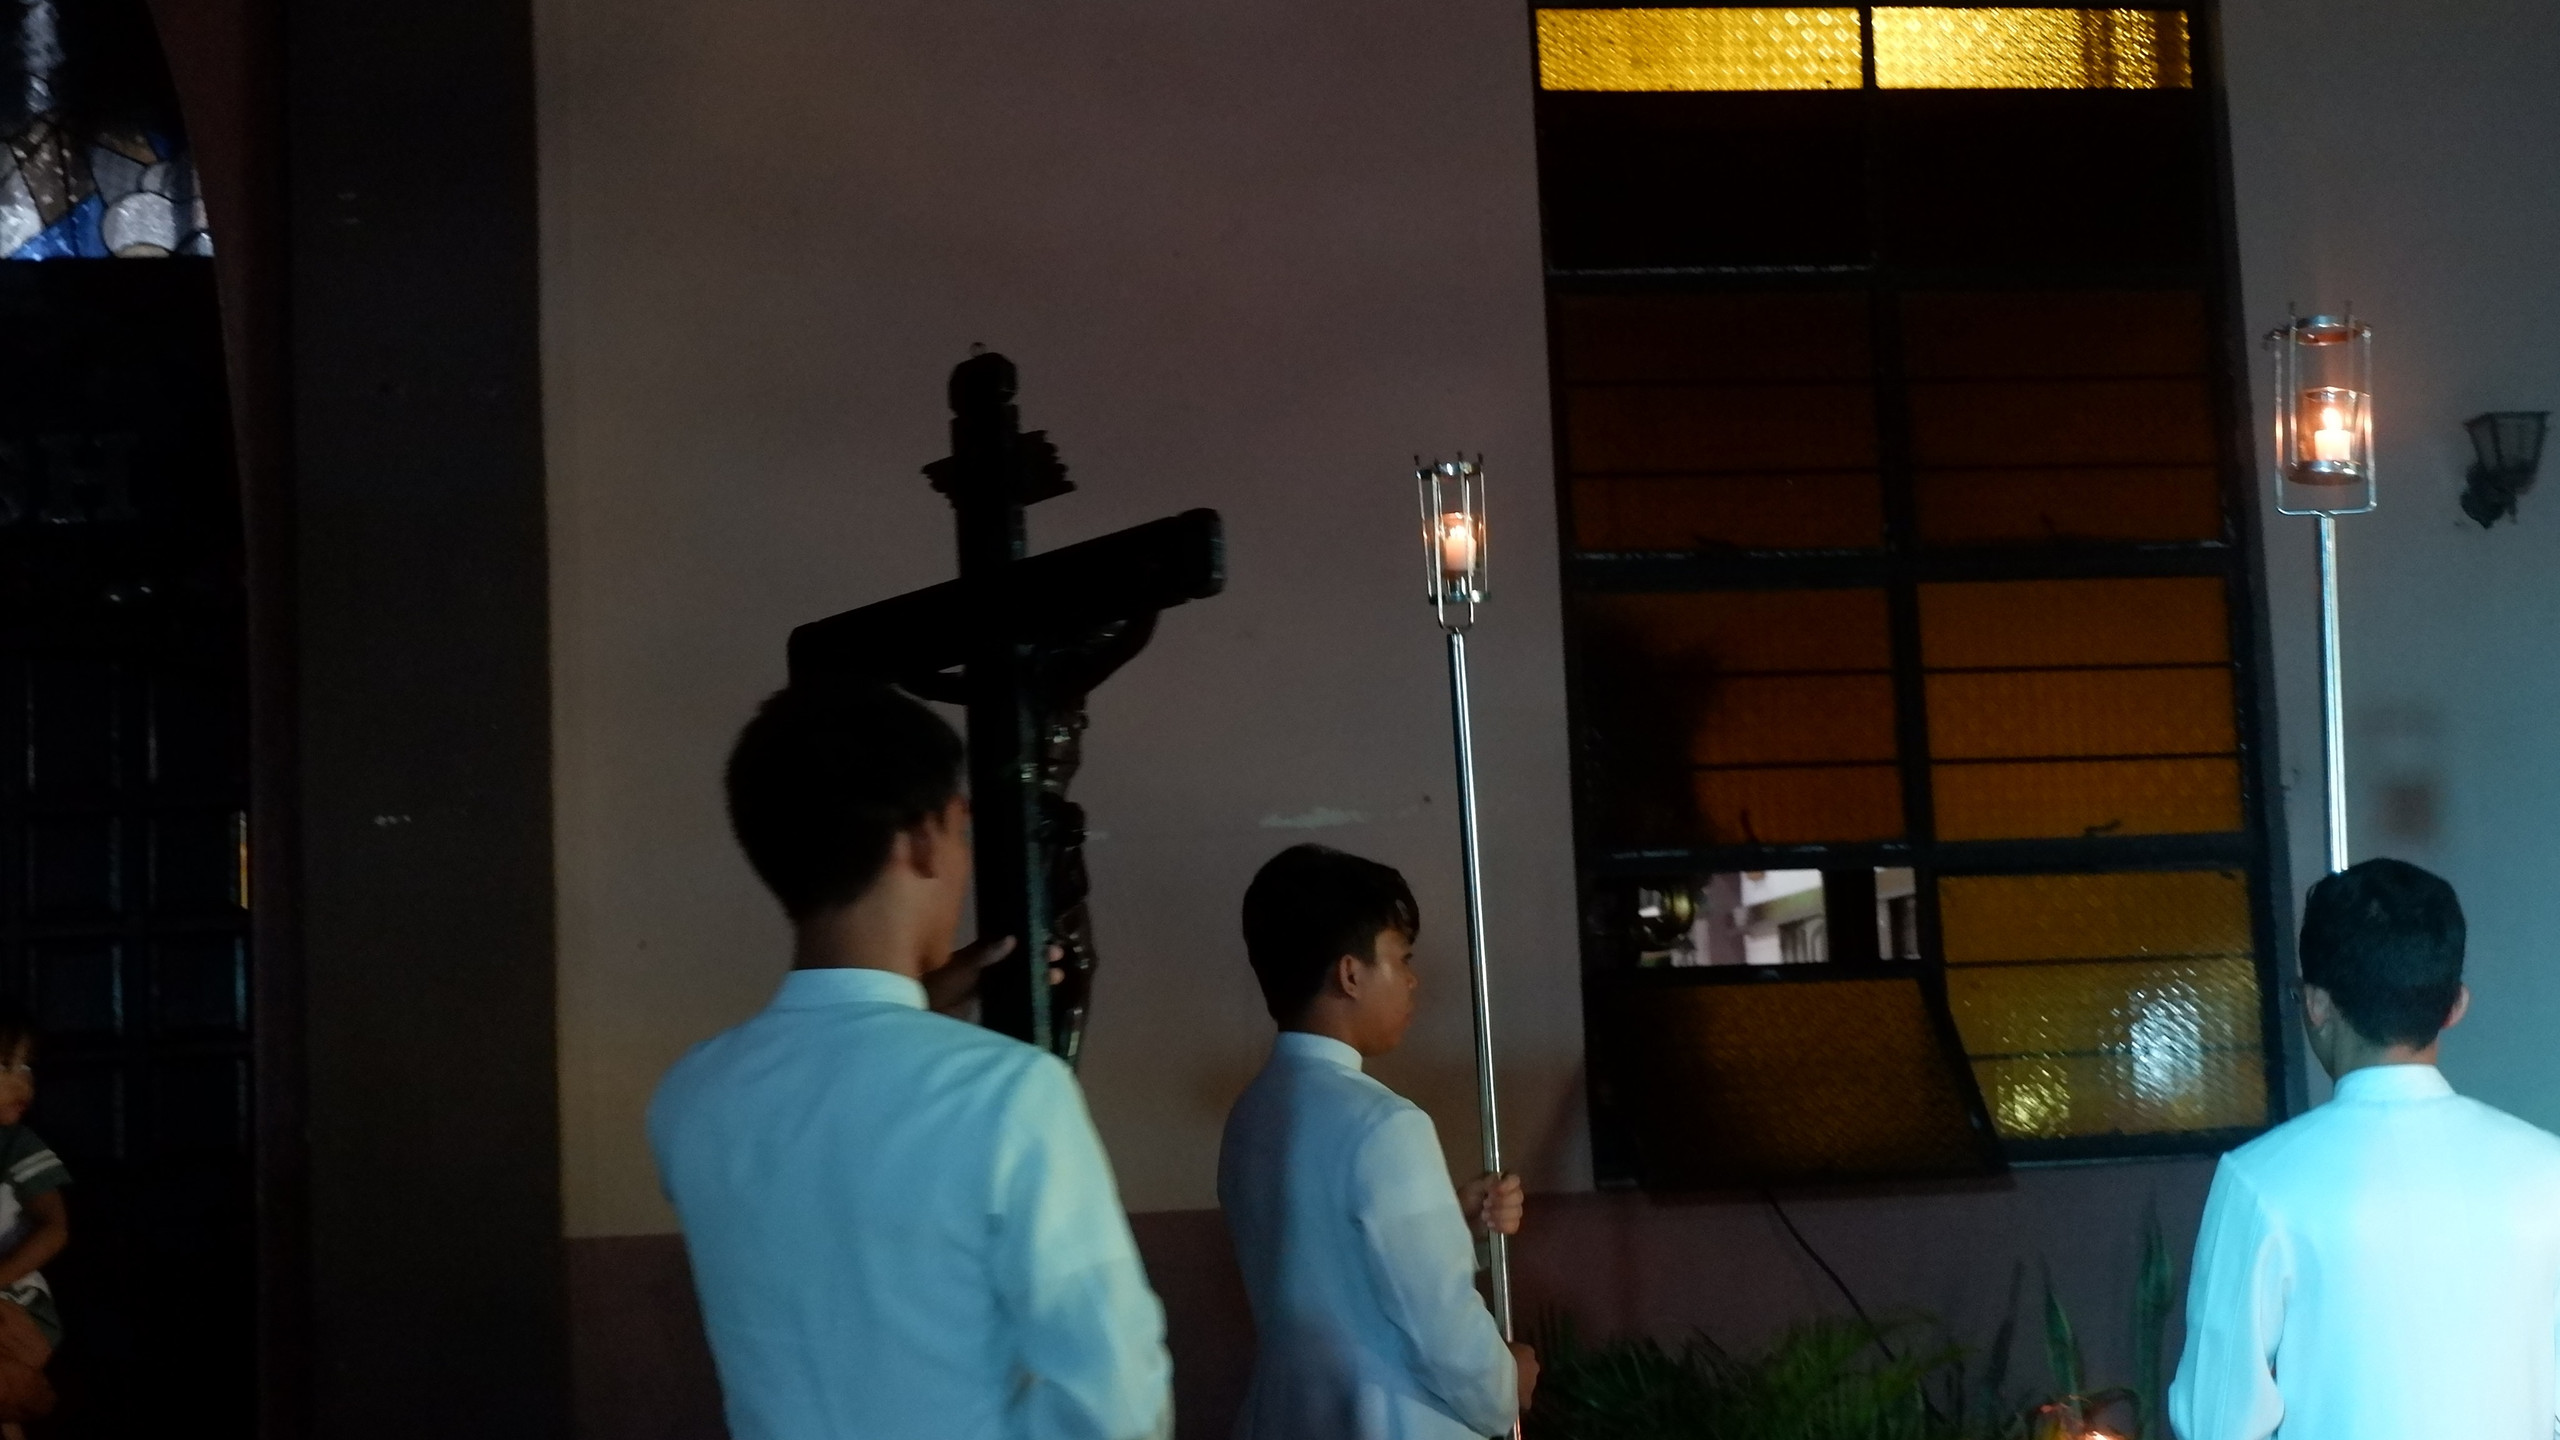 Postulants - prayer